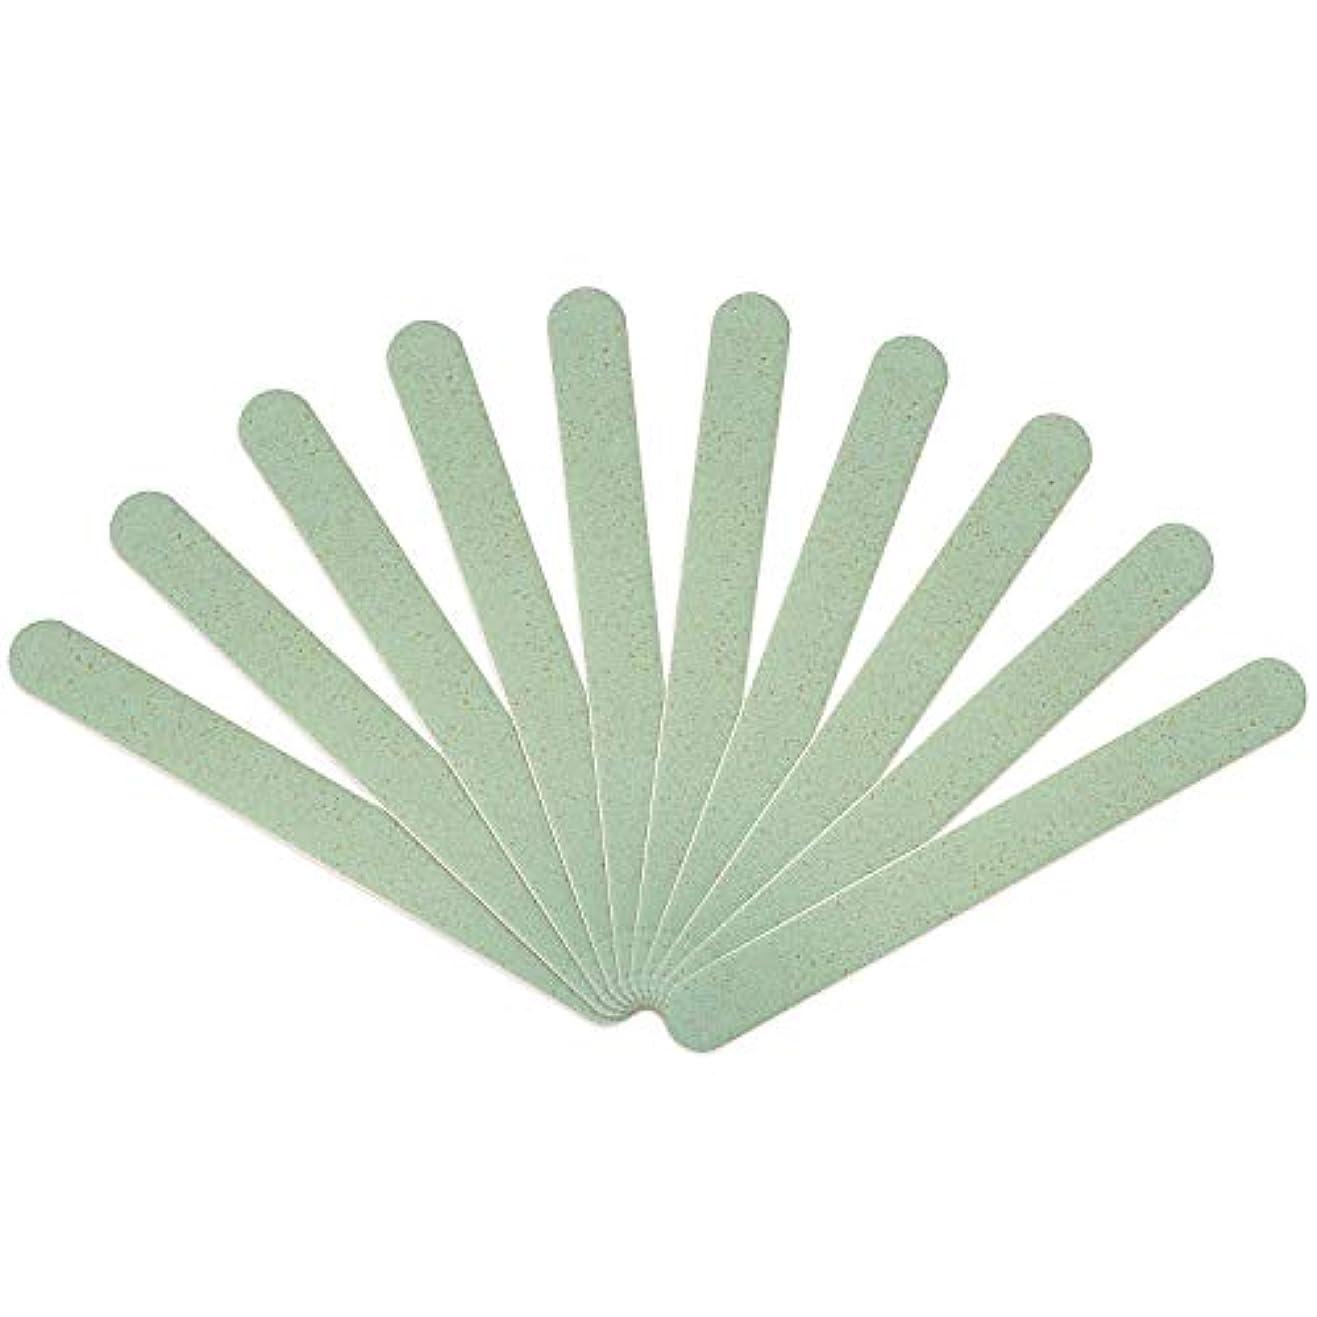 CIPOWバッファー 爪やすり 爪 磨き ネイルシャイナー 10本入バッファー400/6000グリット ネイルをつやつやに スポンジファイル ソフトファイル ネイルポリッシュファイル